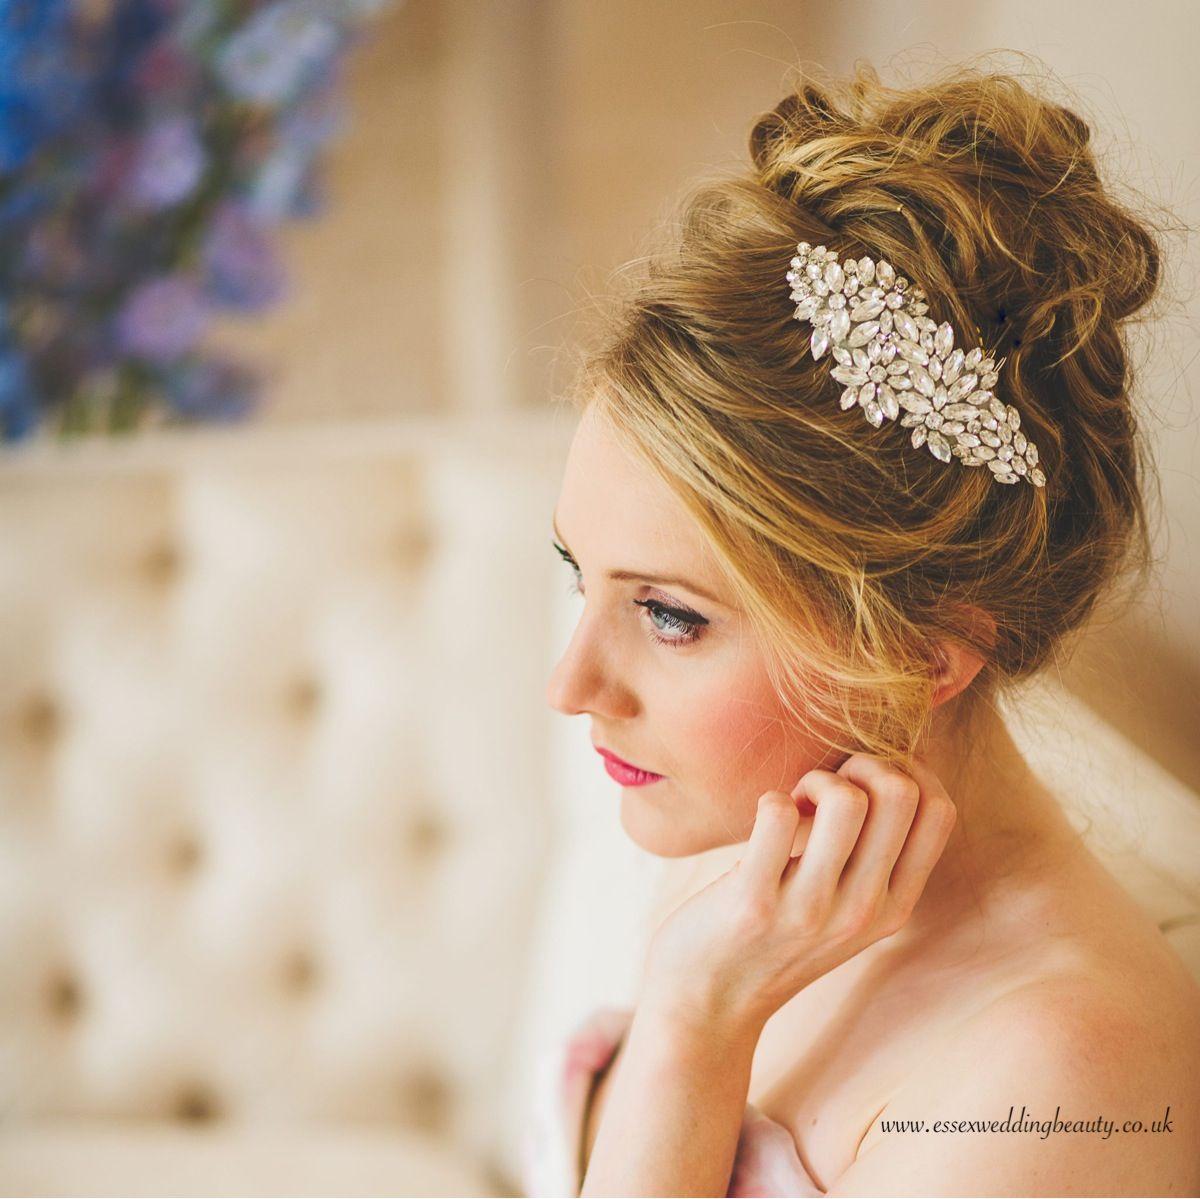 wedding hair jewellery - swarovski hair accessory for bride by